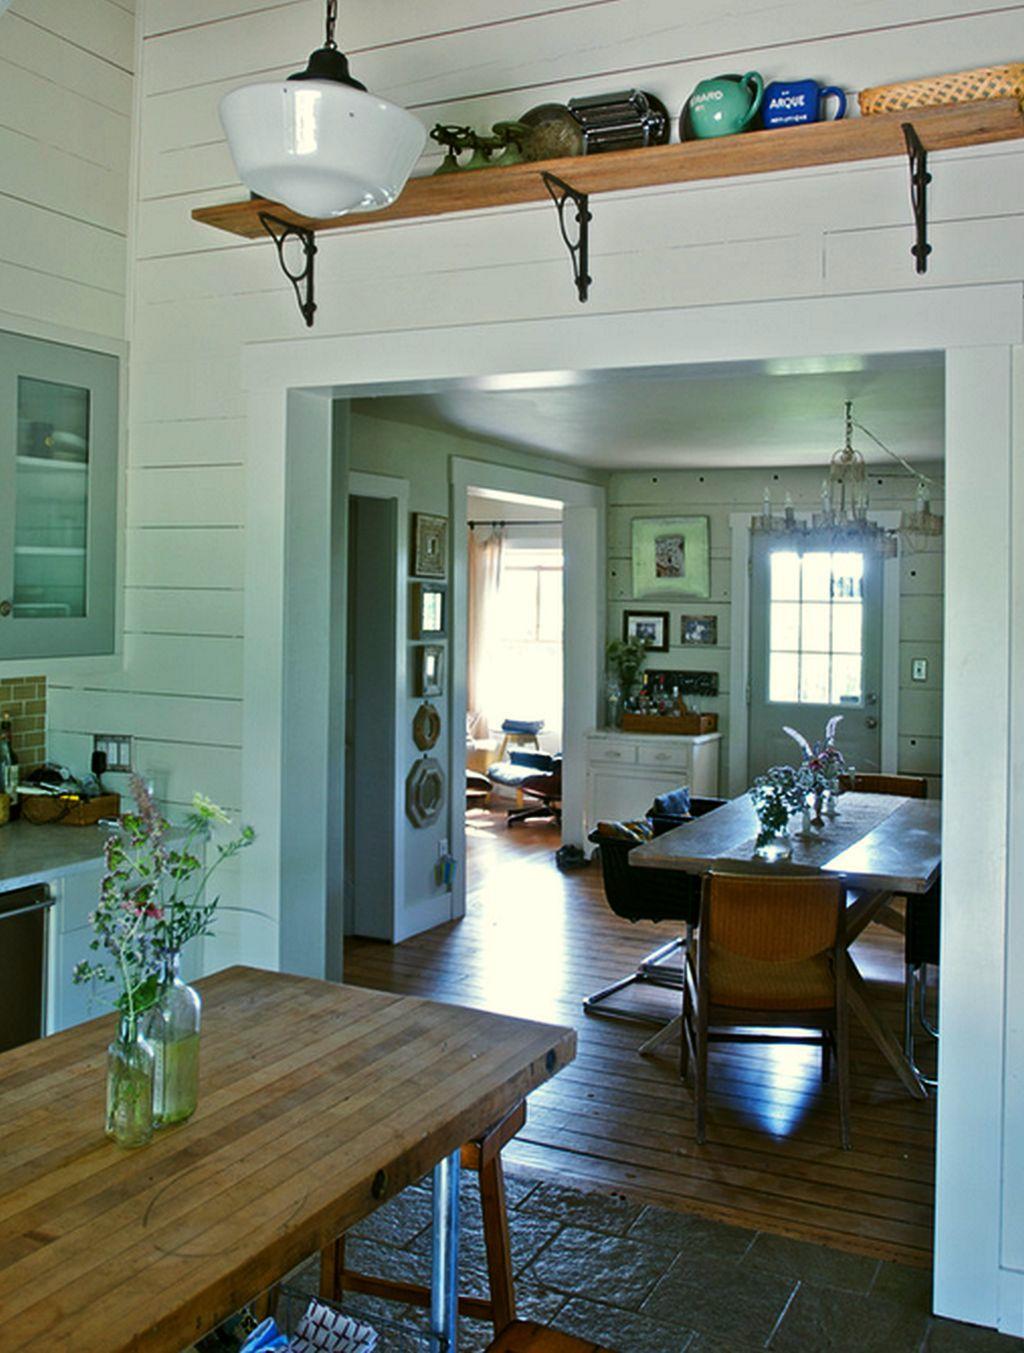 adelaparvu.com despre casa la tara designer Rebekah Zaveloff 6